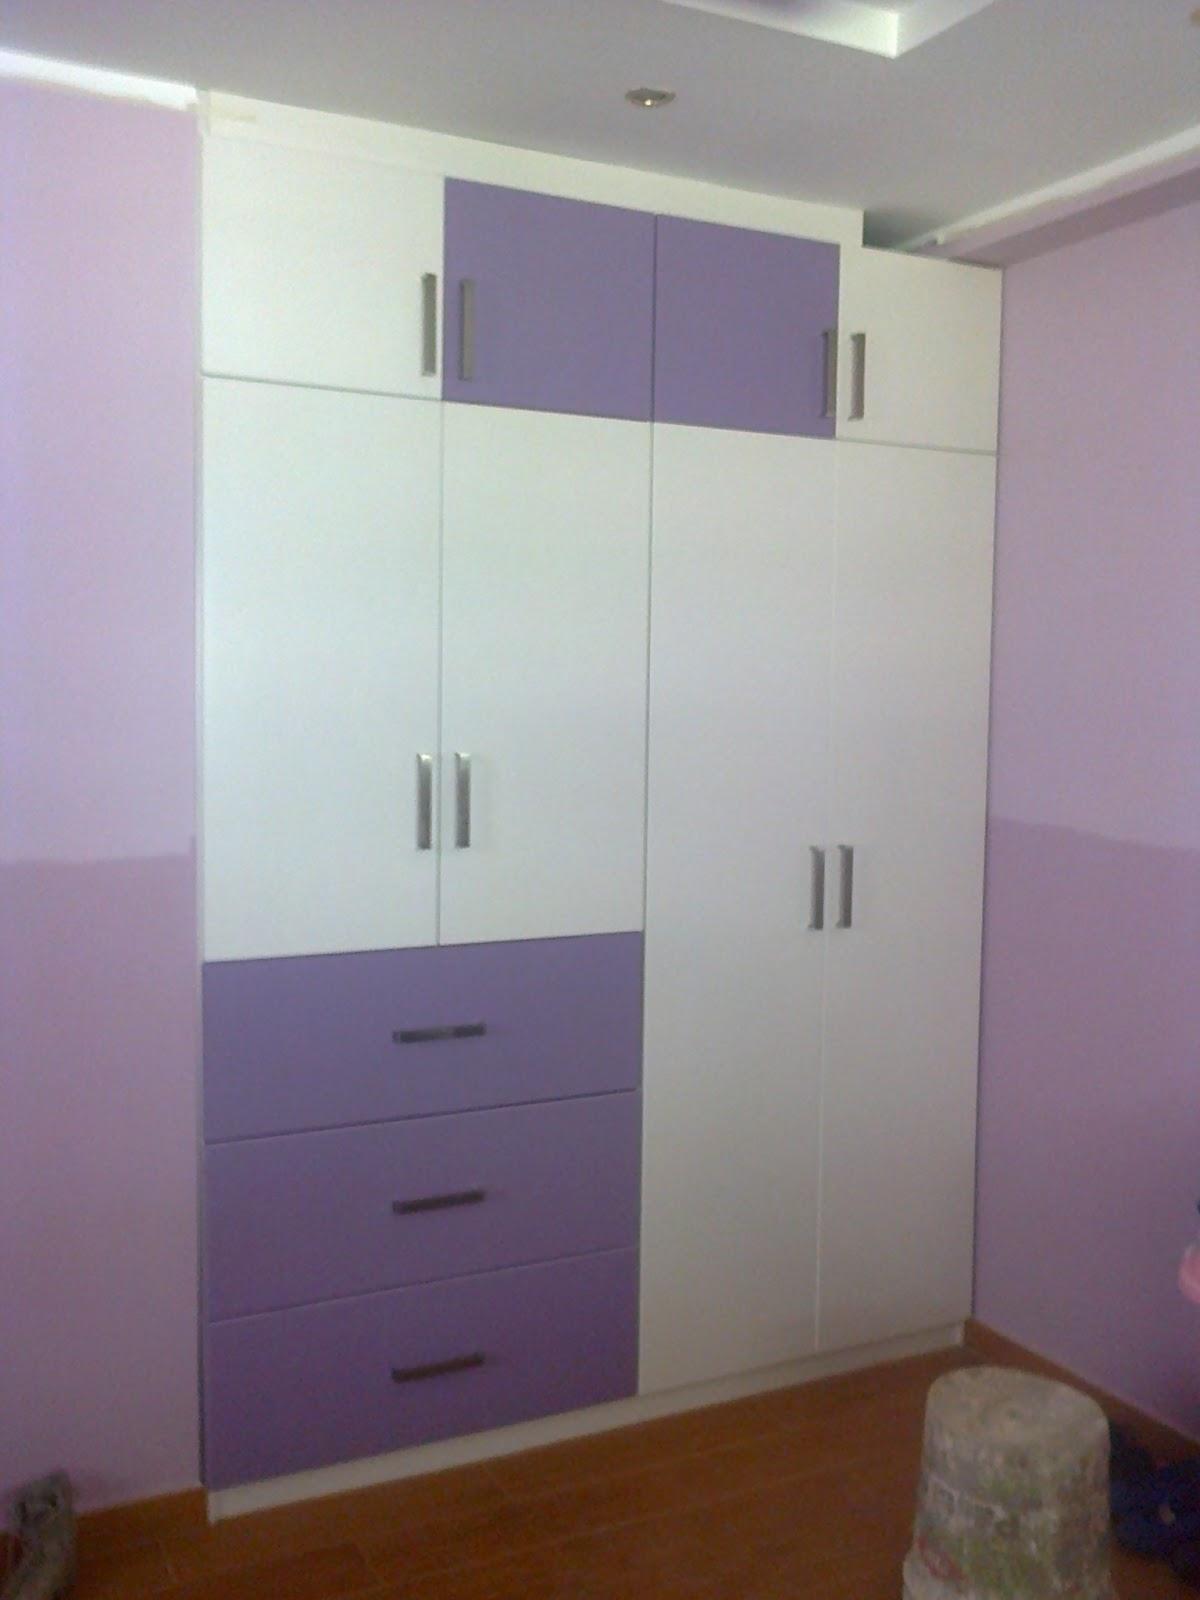 Muebles cusco muebles cusco muebles en cusco cusco for Modelo de tapiceria para dormitorio adulto